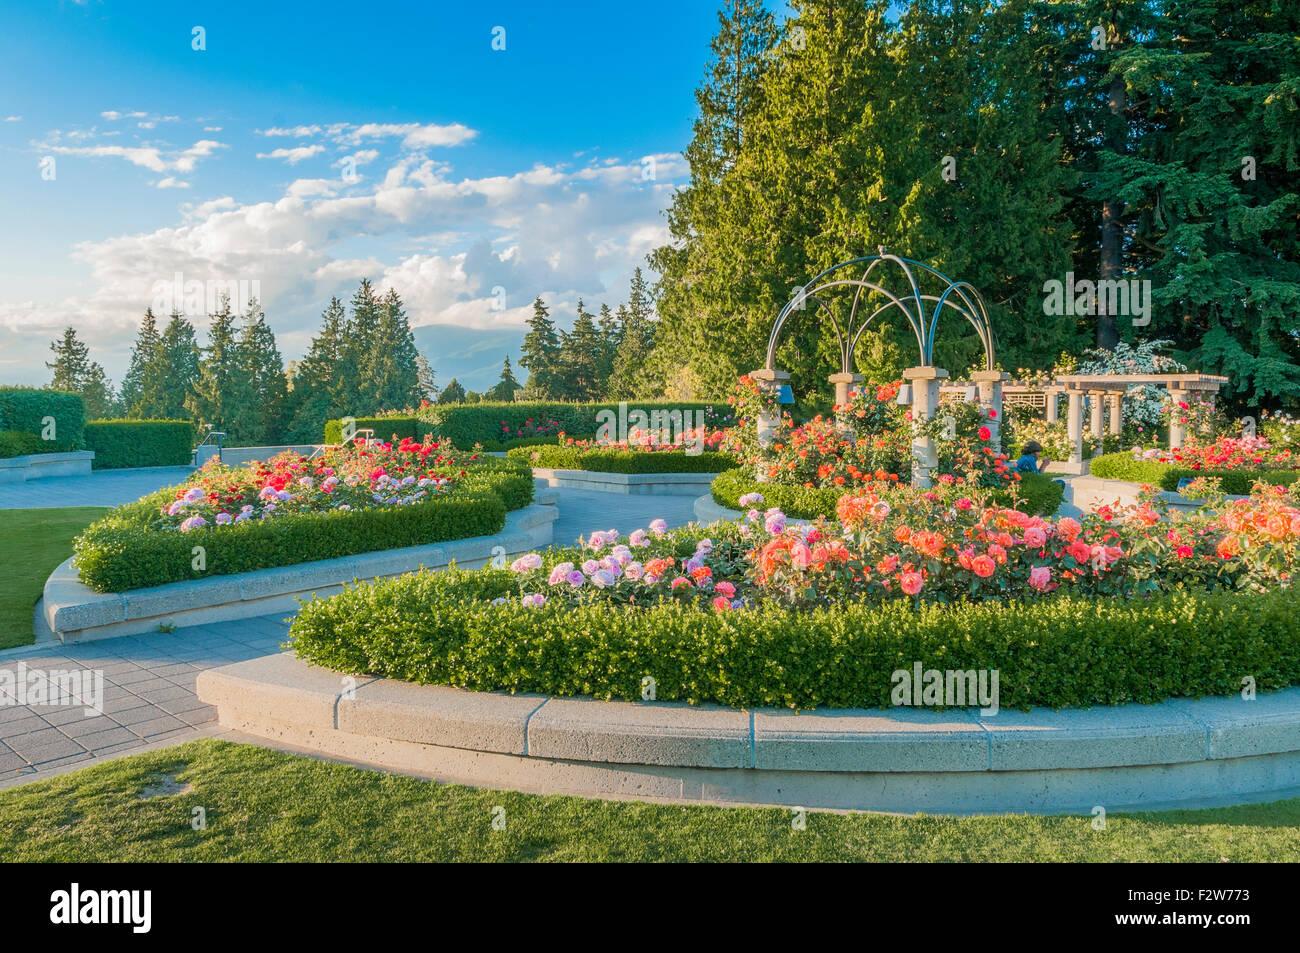 Le jardin de roses, UBC, Vancouver, Colombie-Britannique, Canada Photo Stock